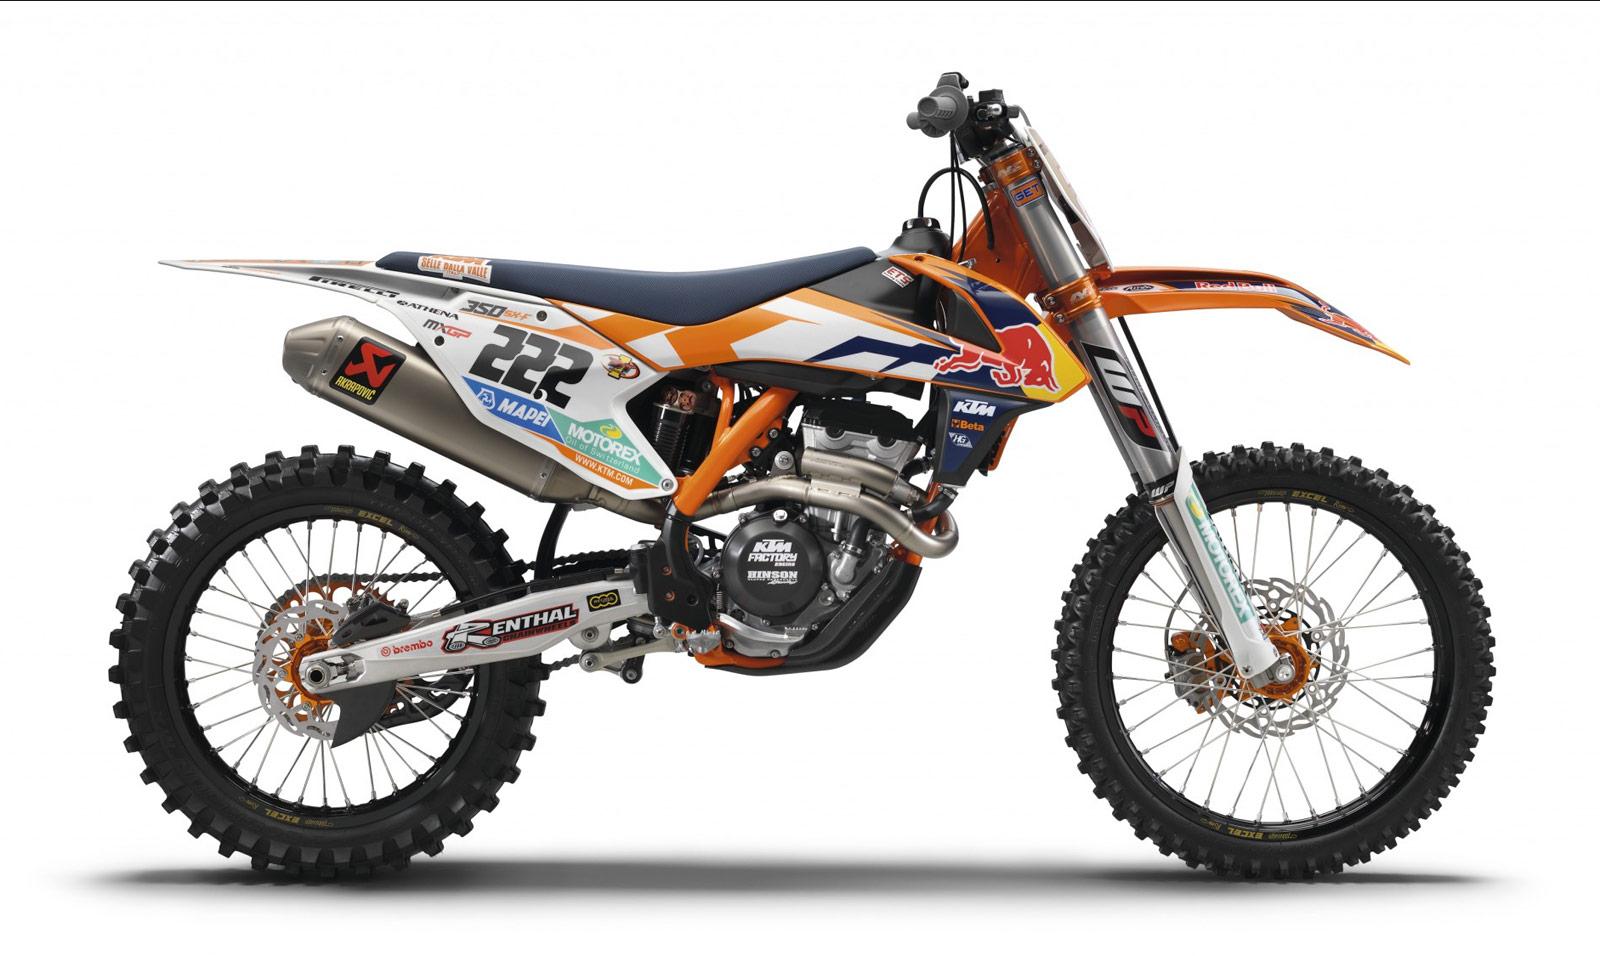 Antonio cairoli 39 s 2015 ktm 350 sx f first look antonio cairoli 39 s 2015 ktm 350 sx f - Moto cross ktm a colorier ...